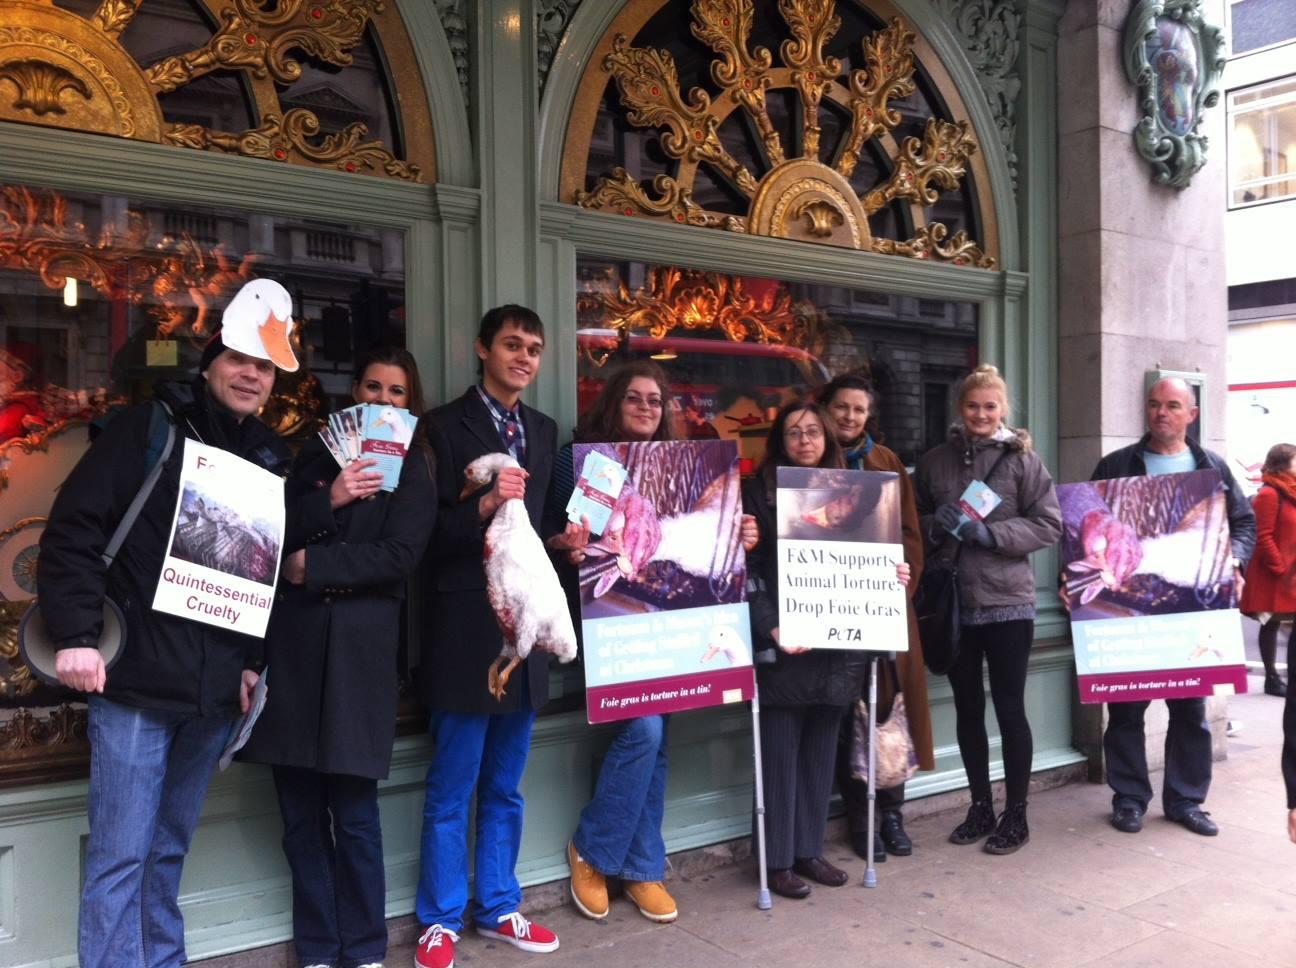 PETA demo against foie gras